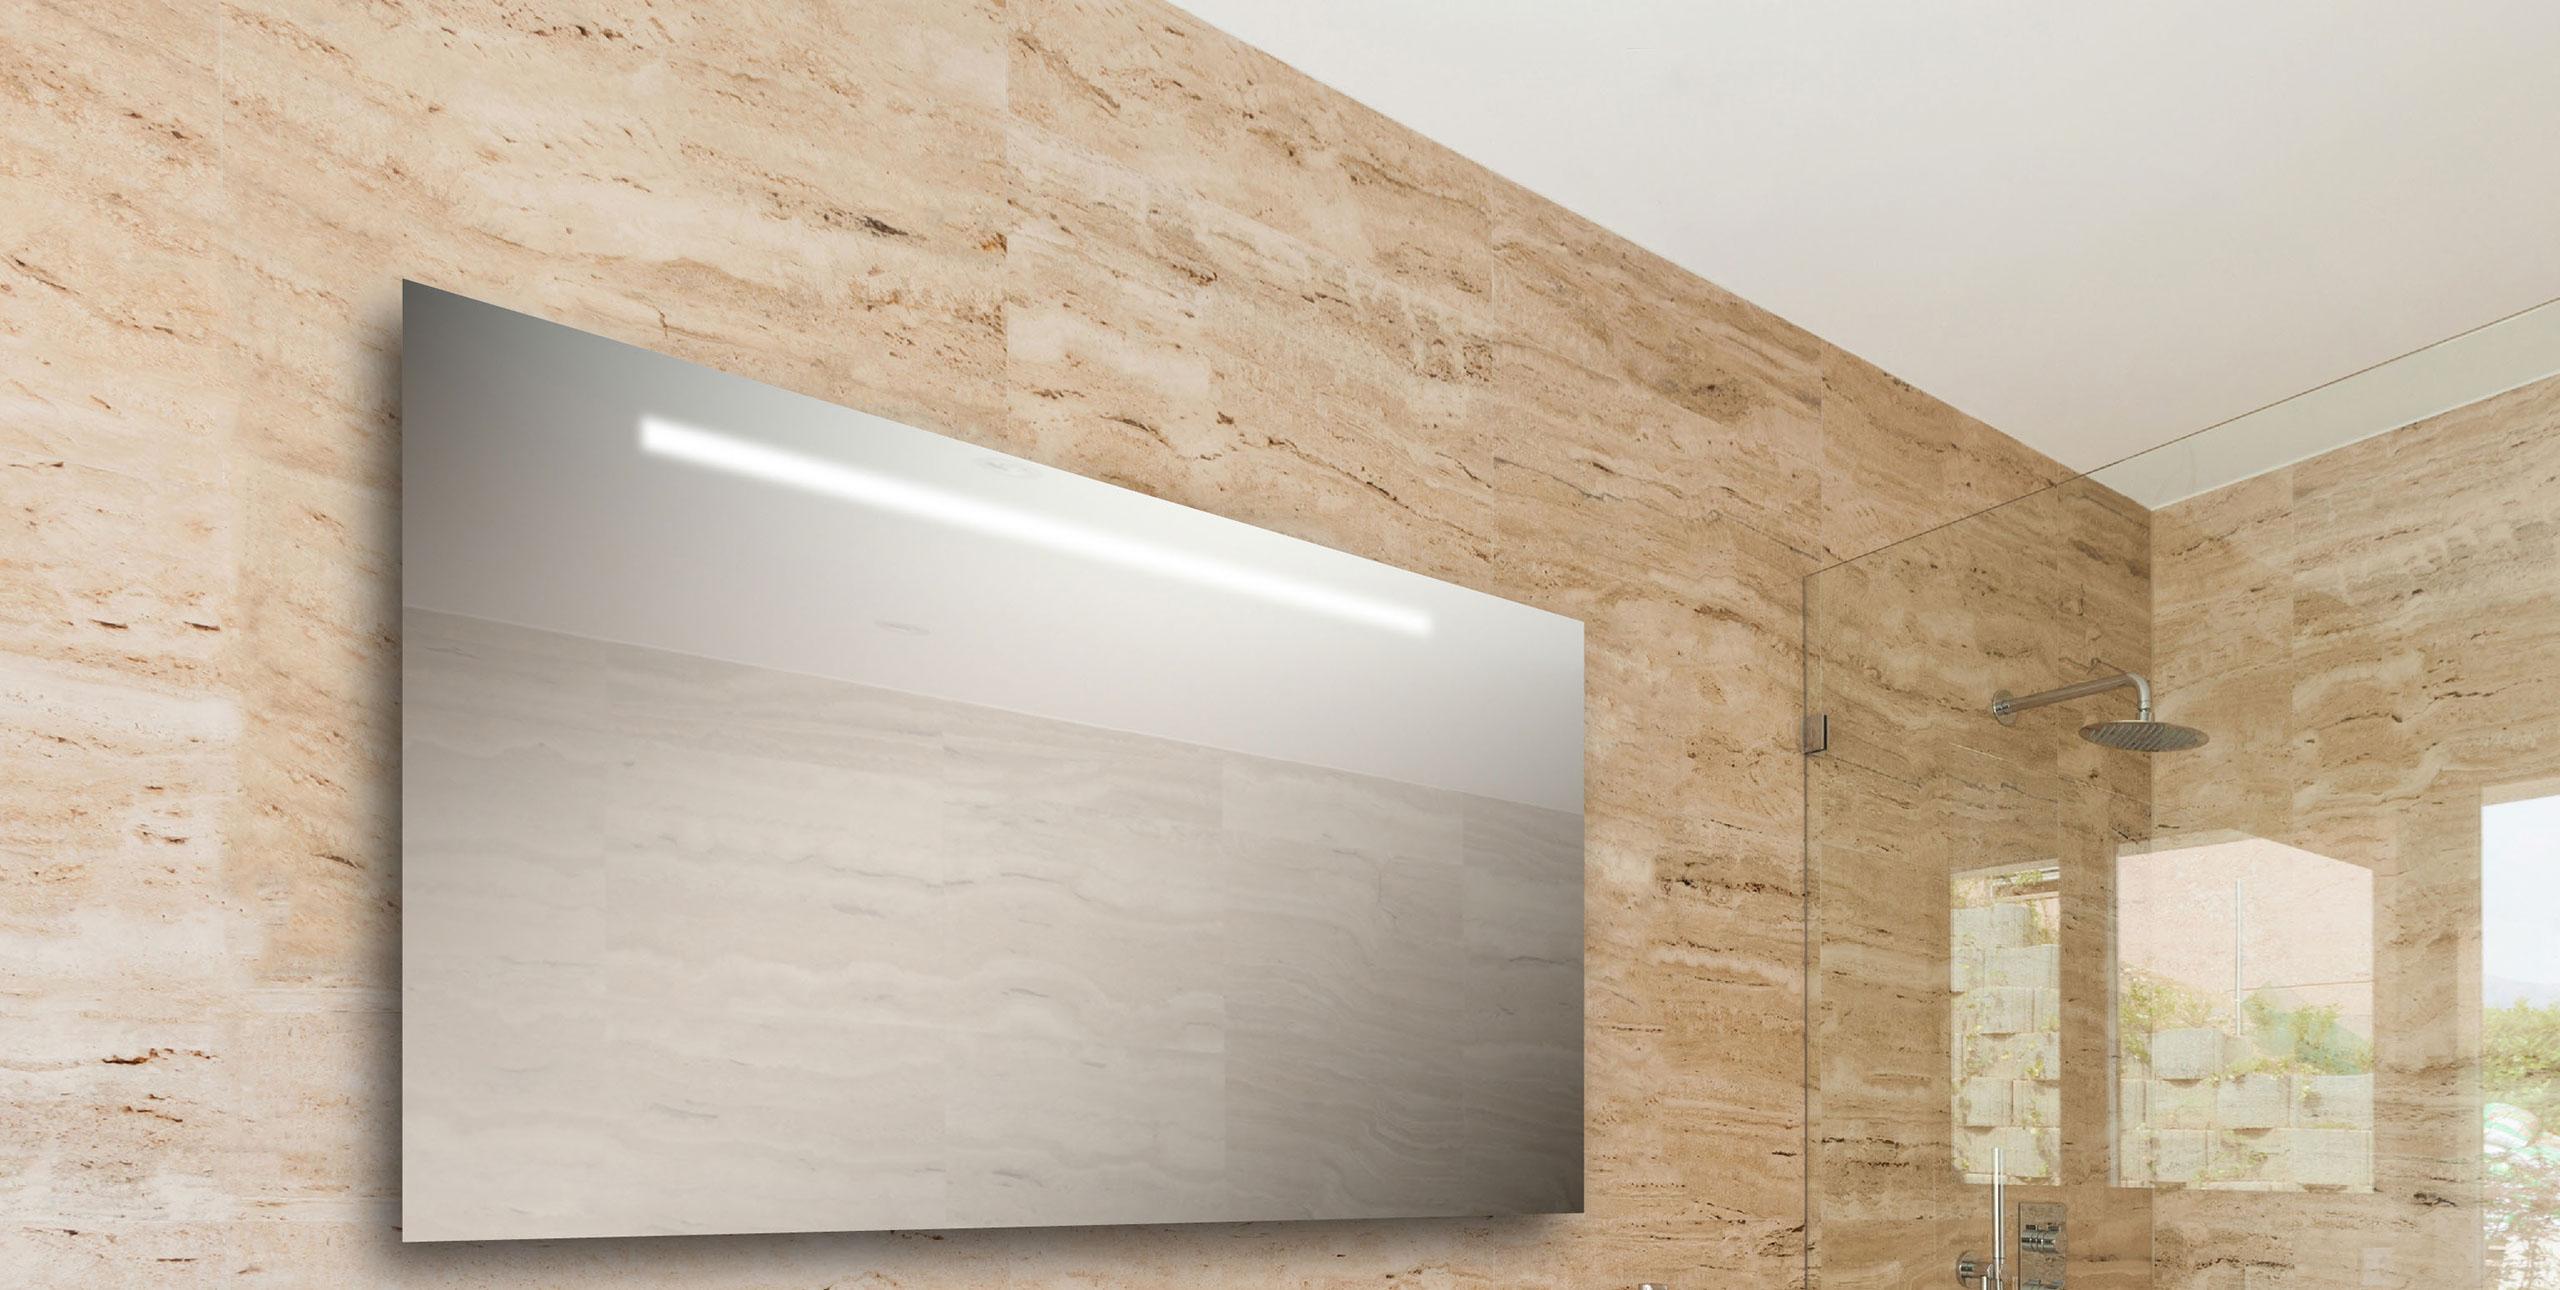 Badkamer spiegel amazing led spiegel met verwarming en sensor x